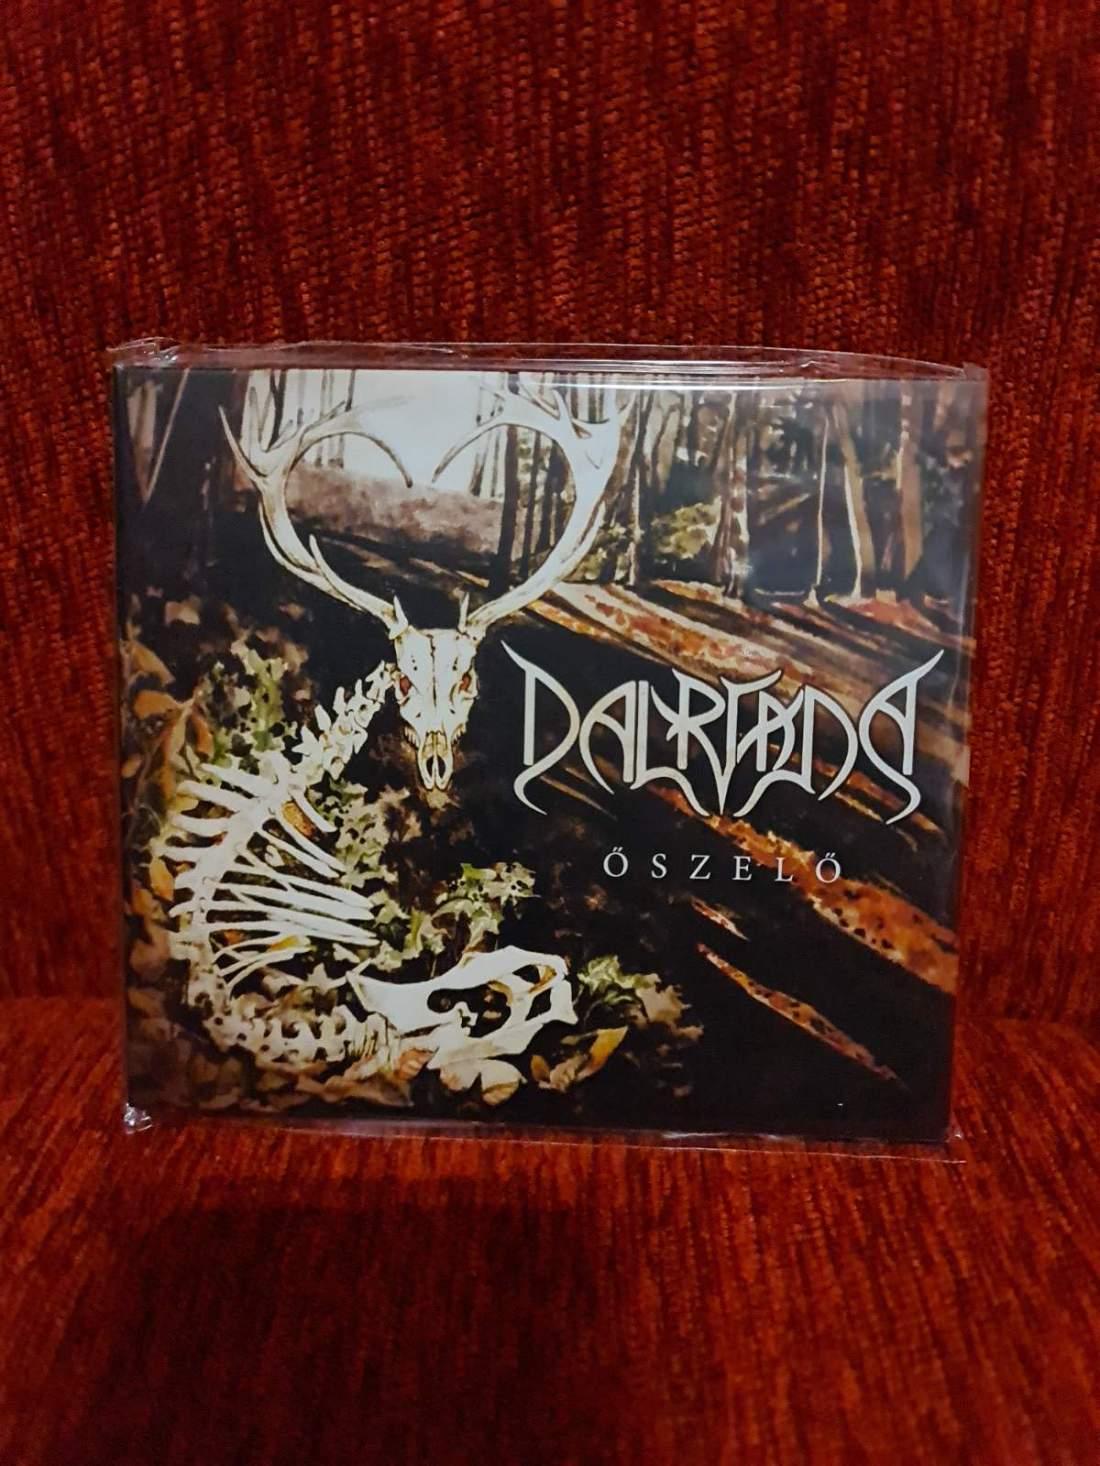 DALRIADA - ŐSZELŐ 2CD+DVD